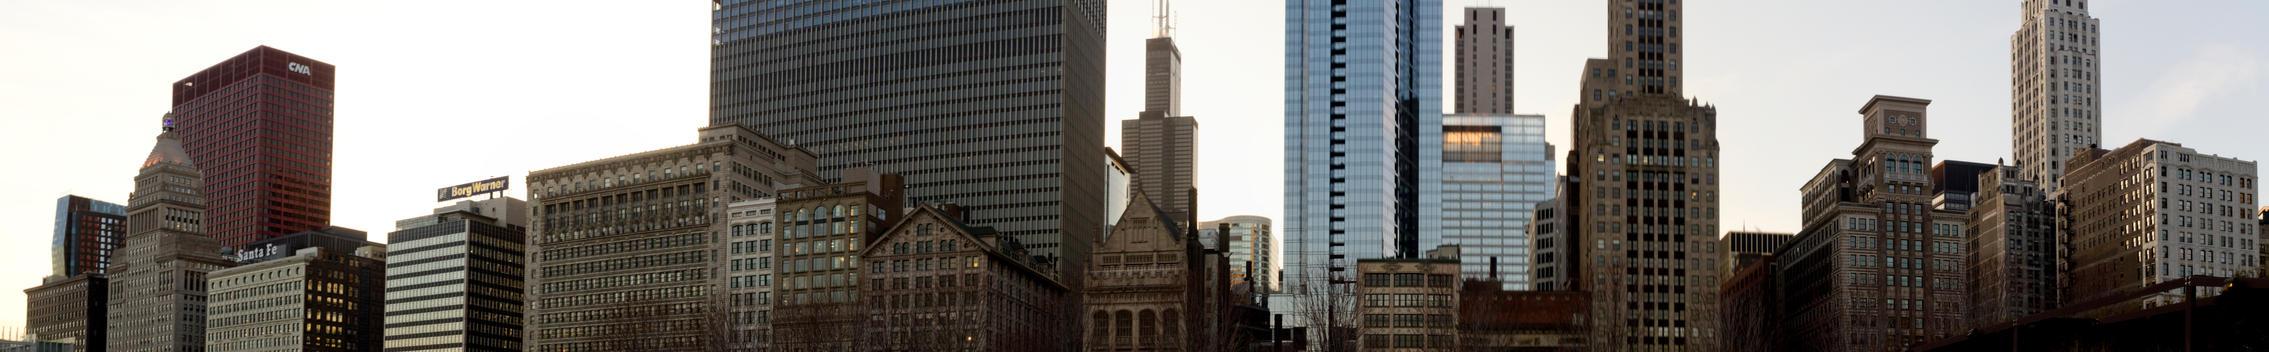 Chicago Skyline Panorama by NeoEonUmbraShadow